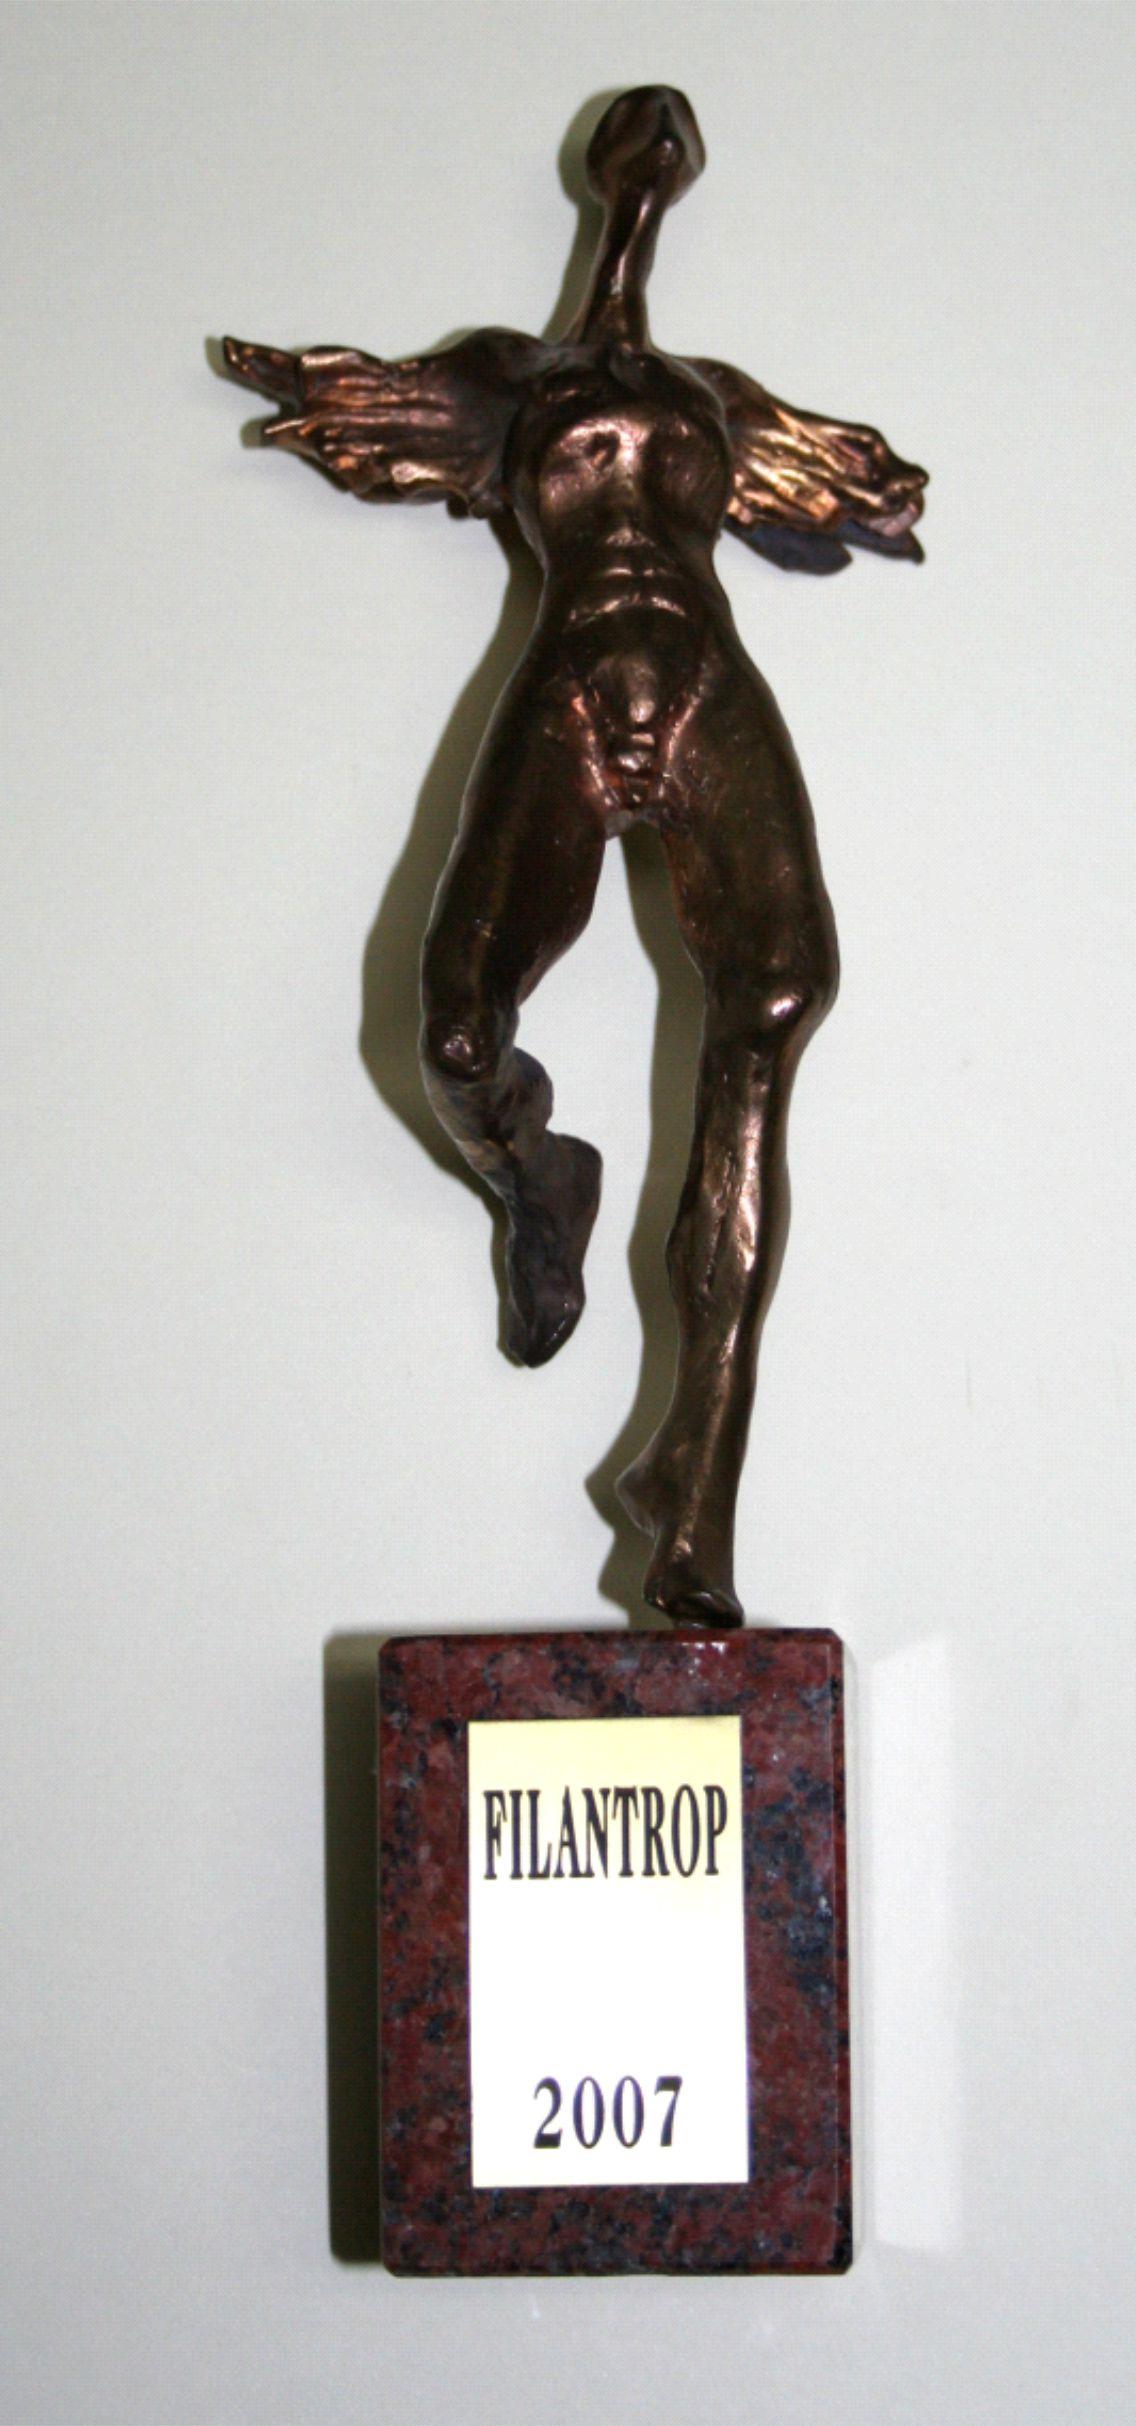 Filantrop 2007